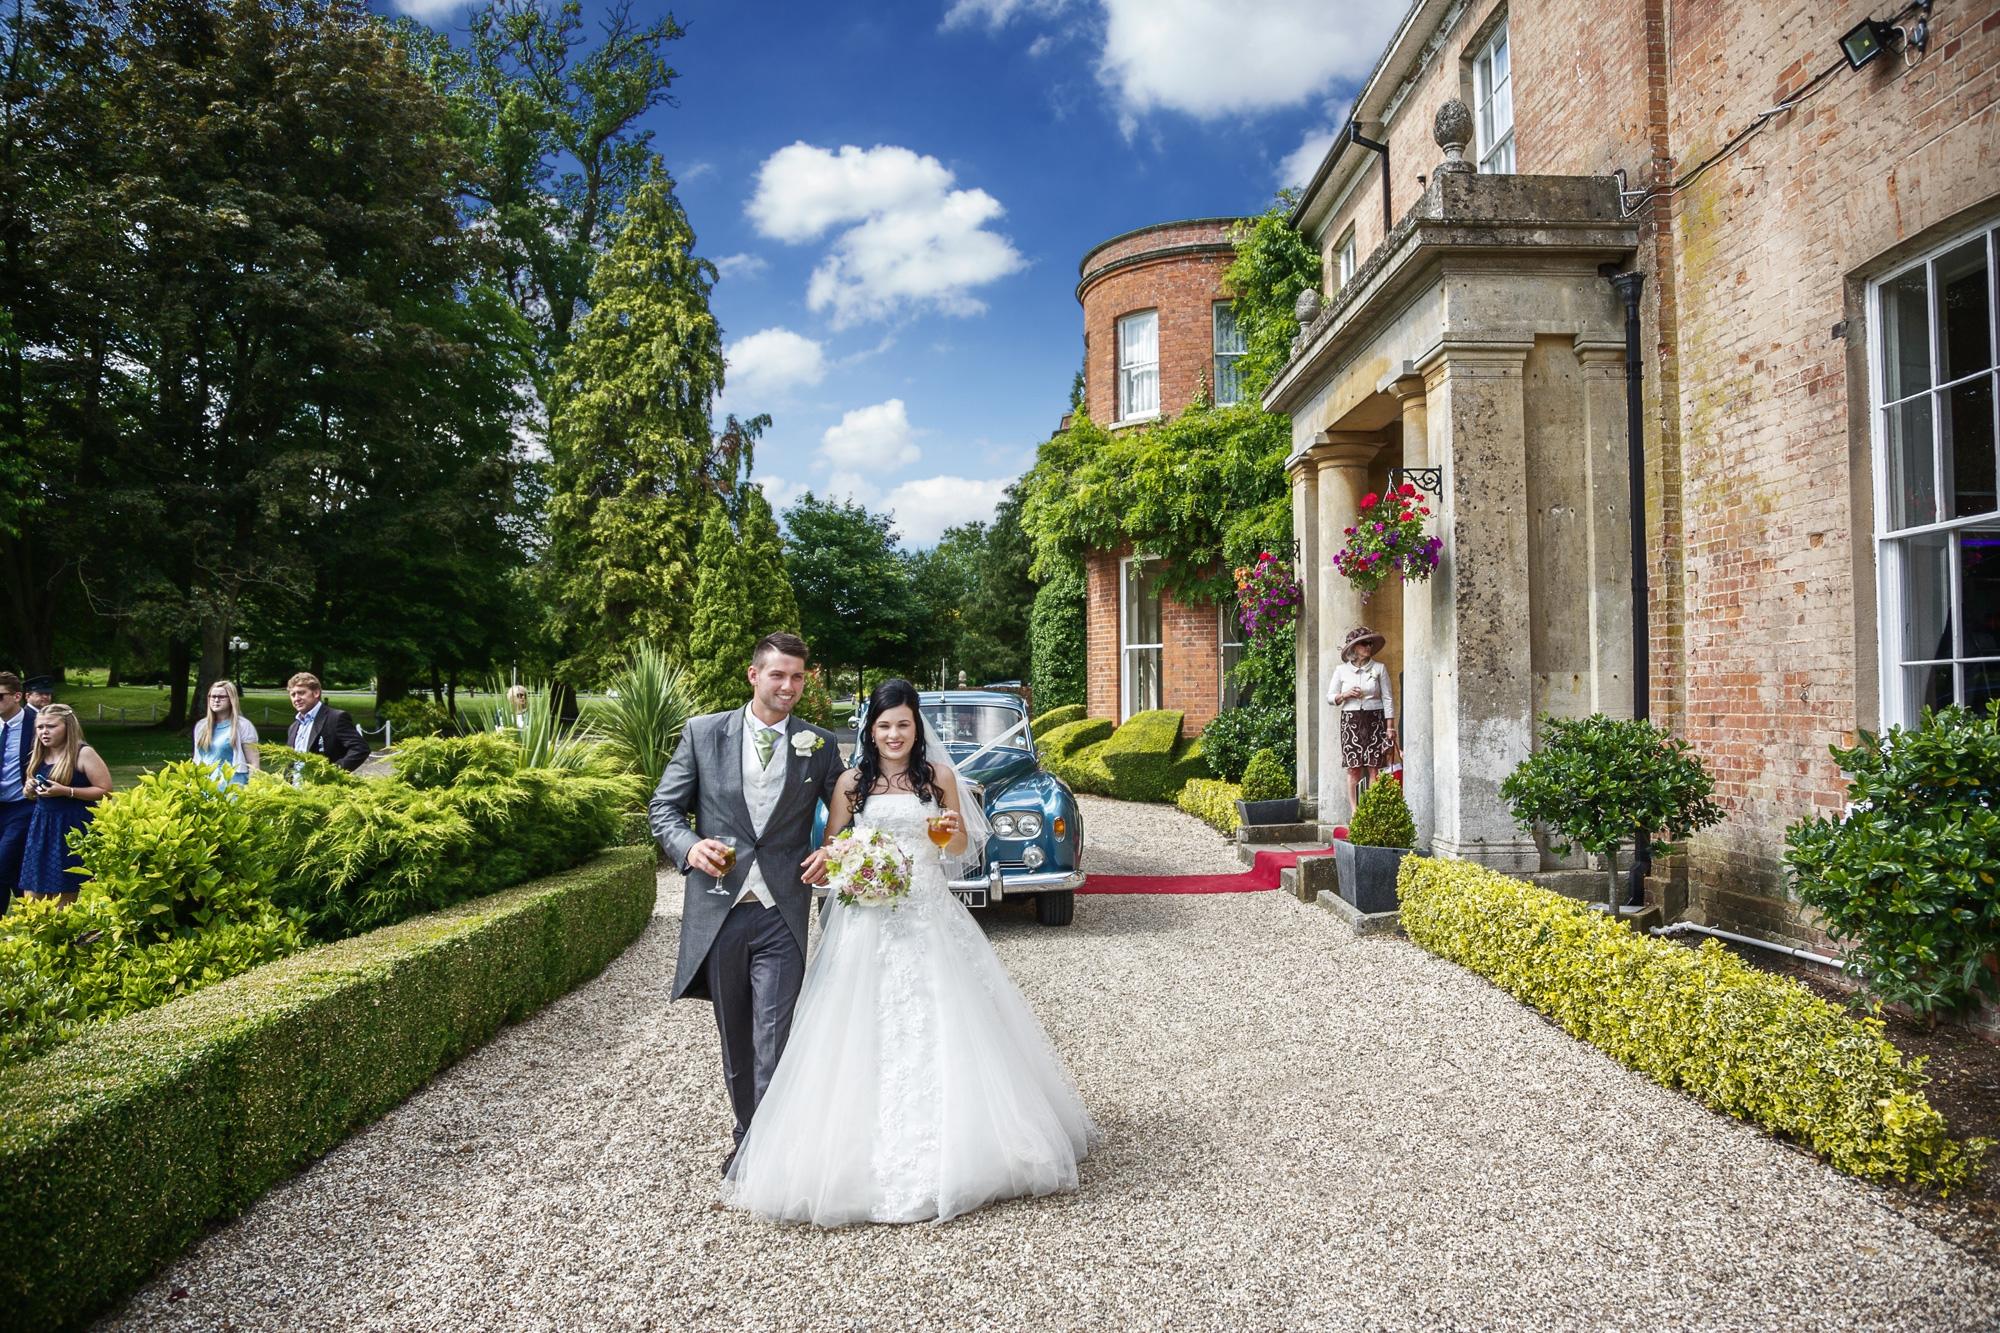 Adam_Hillier_Wedding_Photographer_Newbury_Berkshire_6 (6).jpg